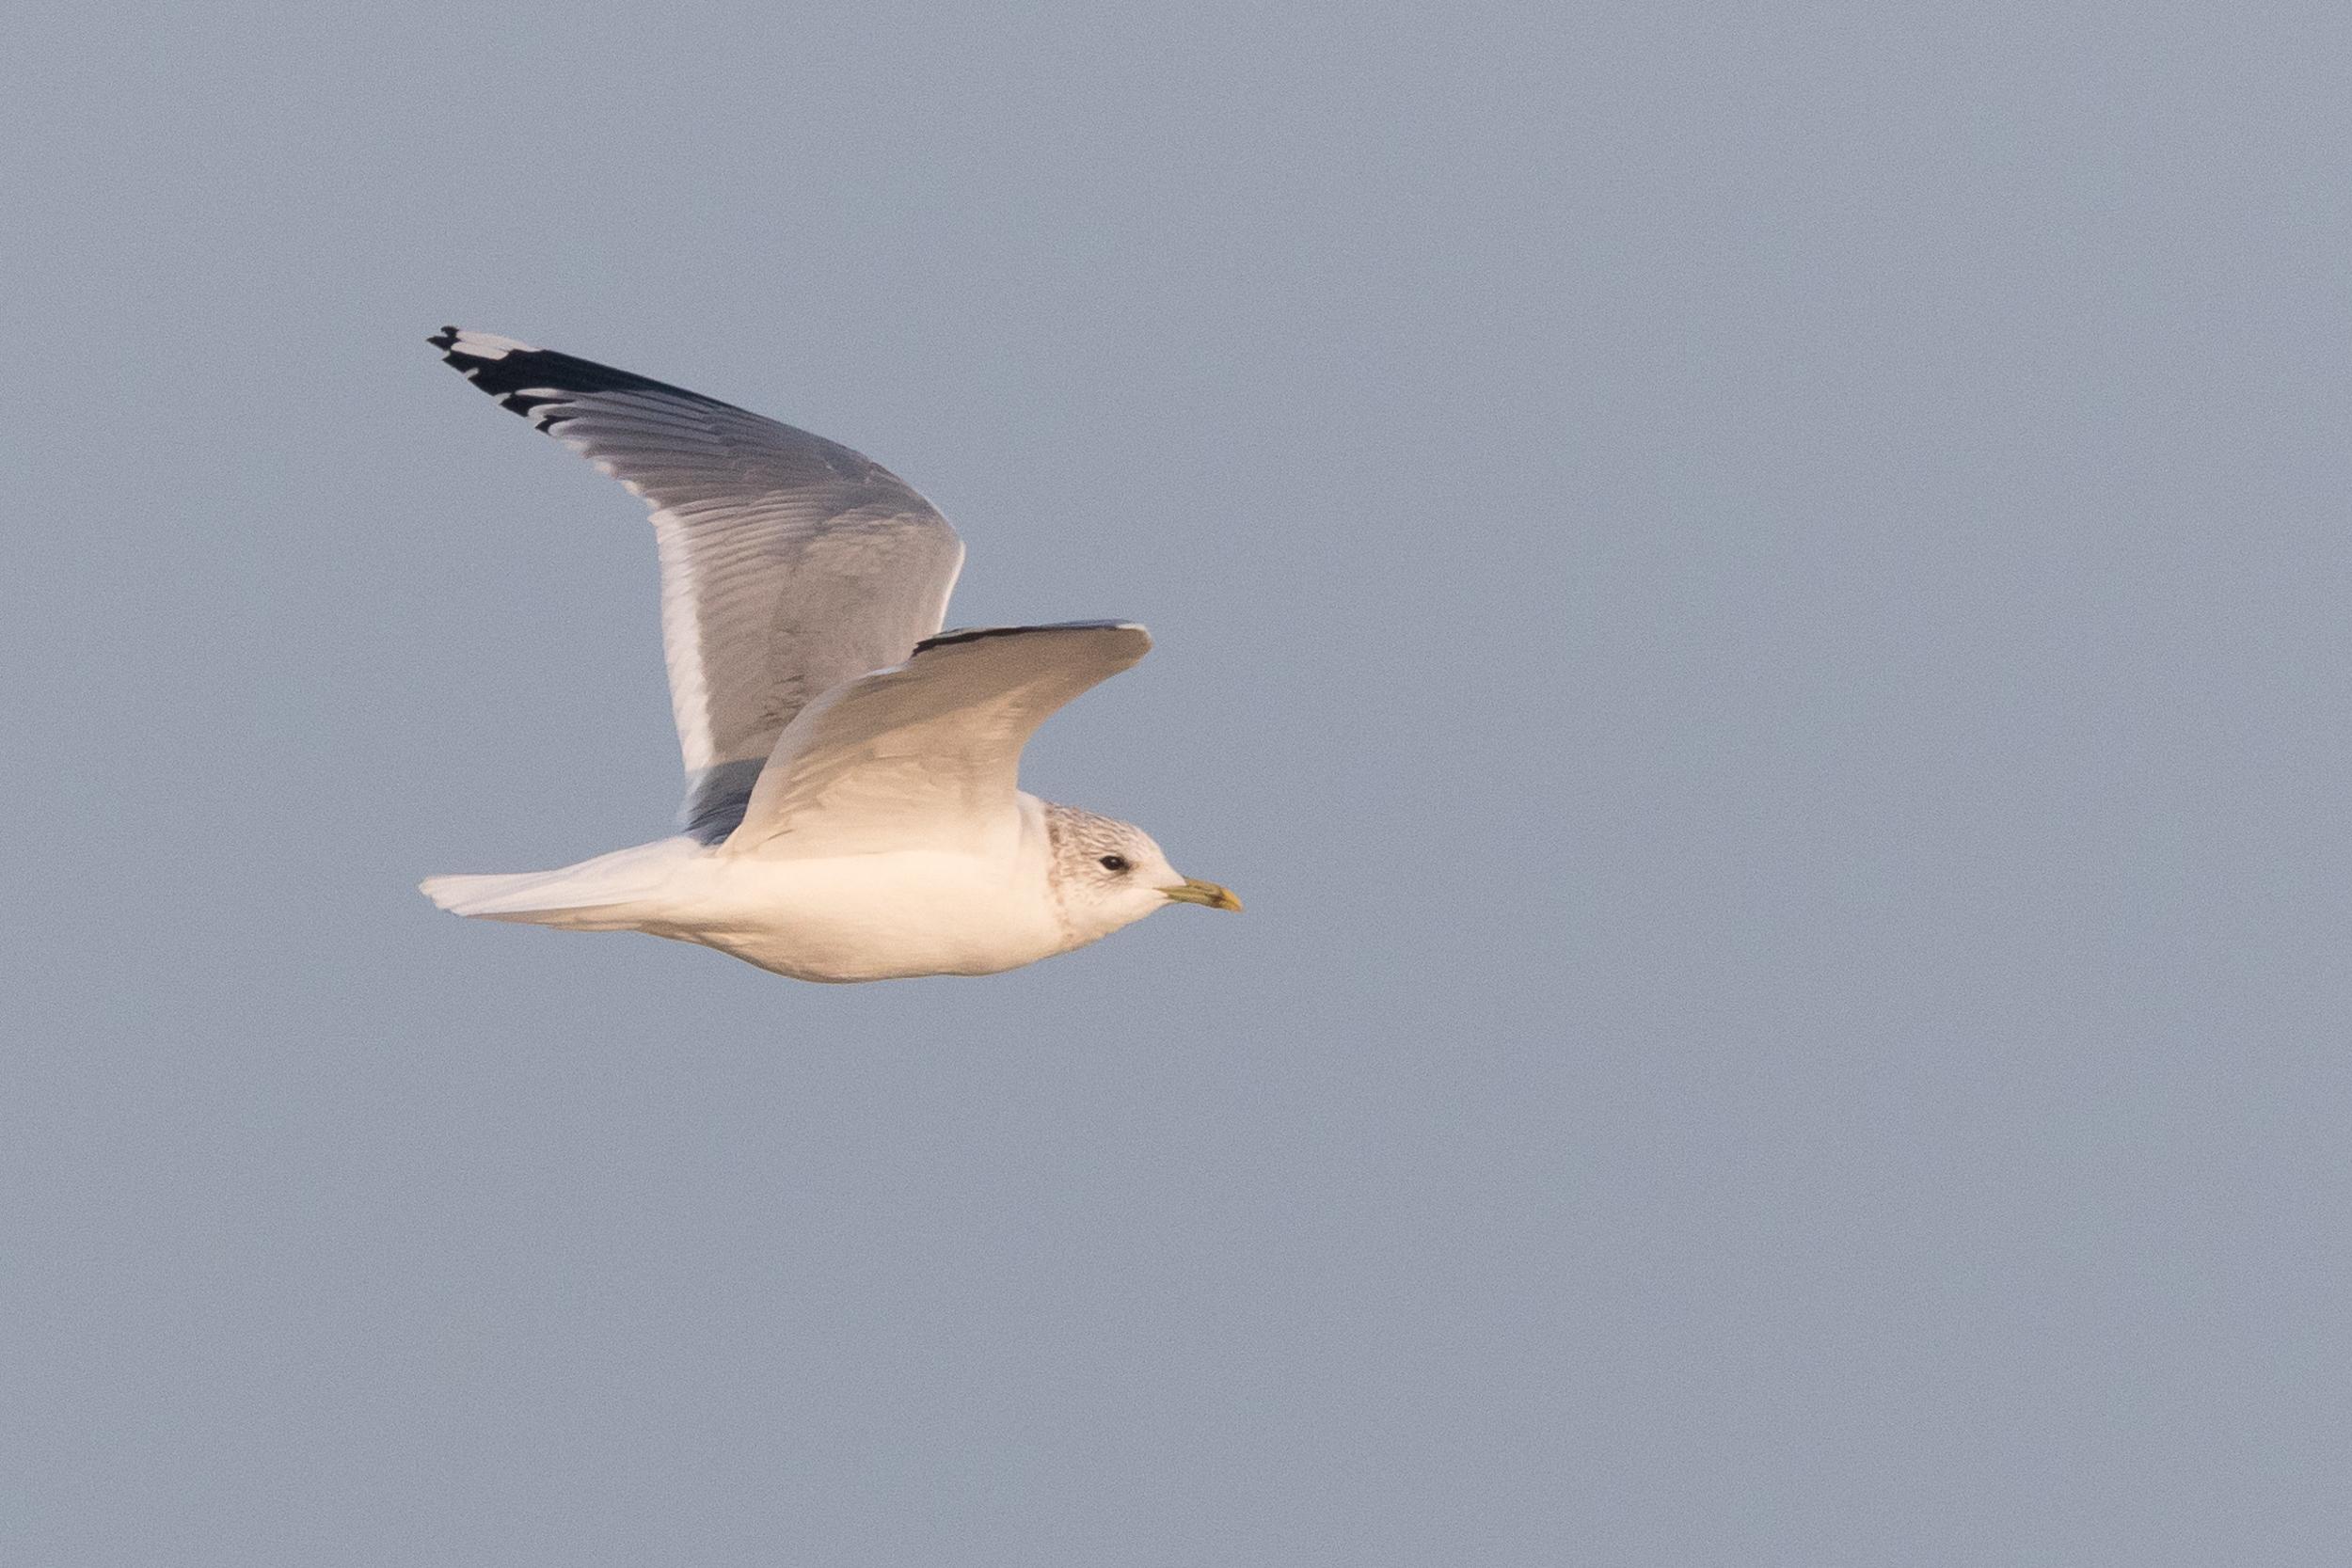 20170126-Common Gull Adult-146.jpg